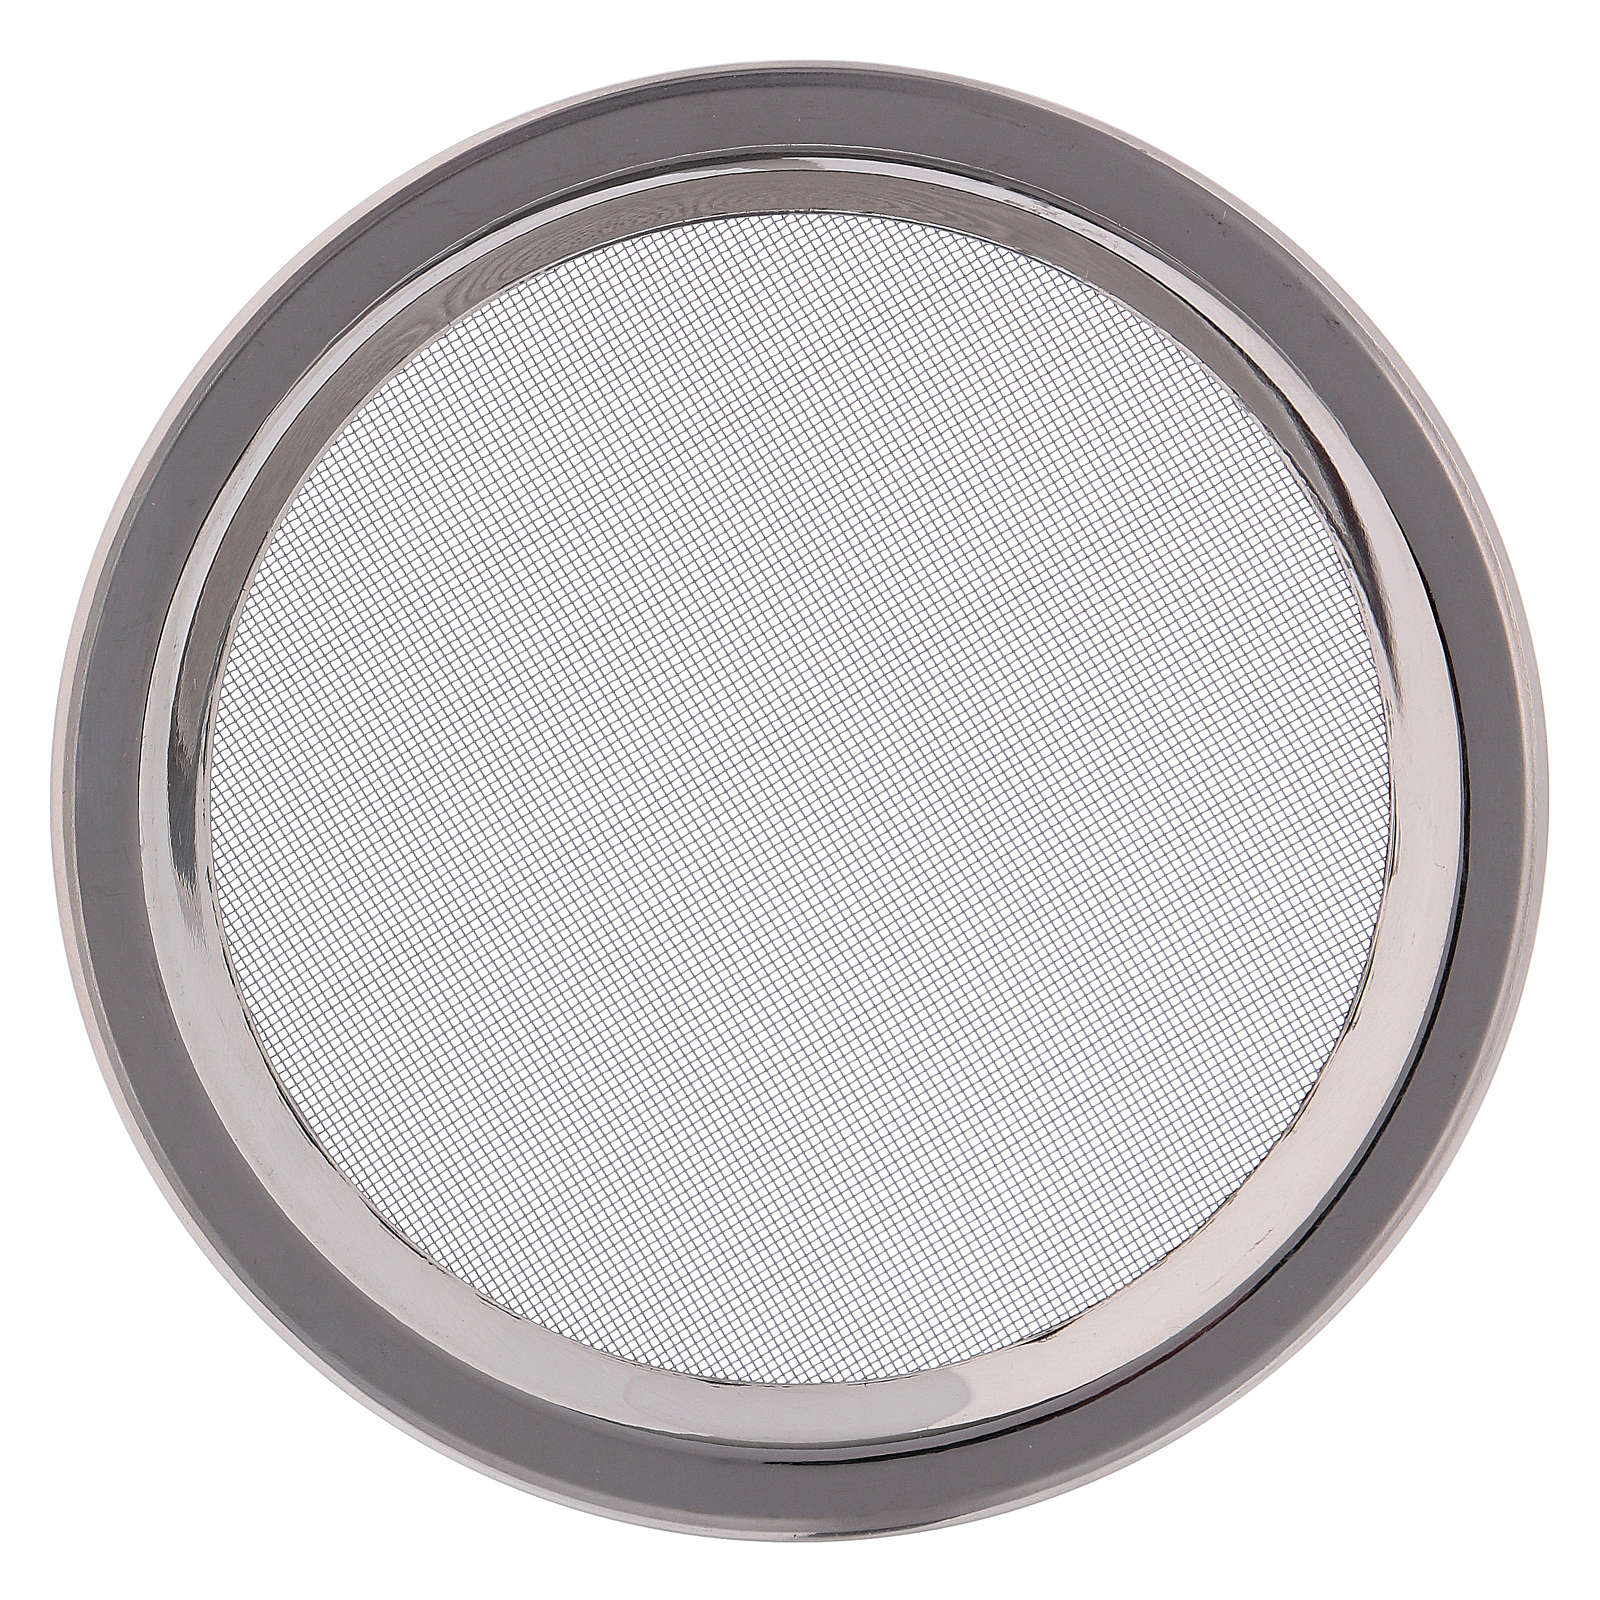 Retina ricambio per bruciaincenso d. 10,5 cm 3